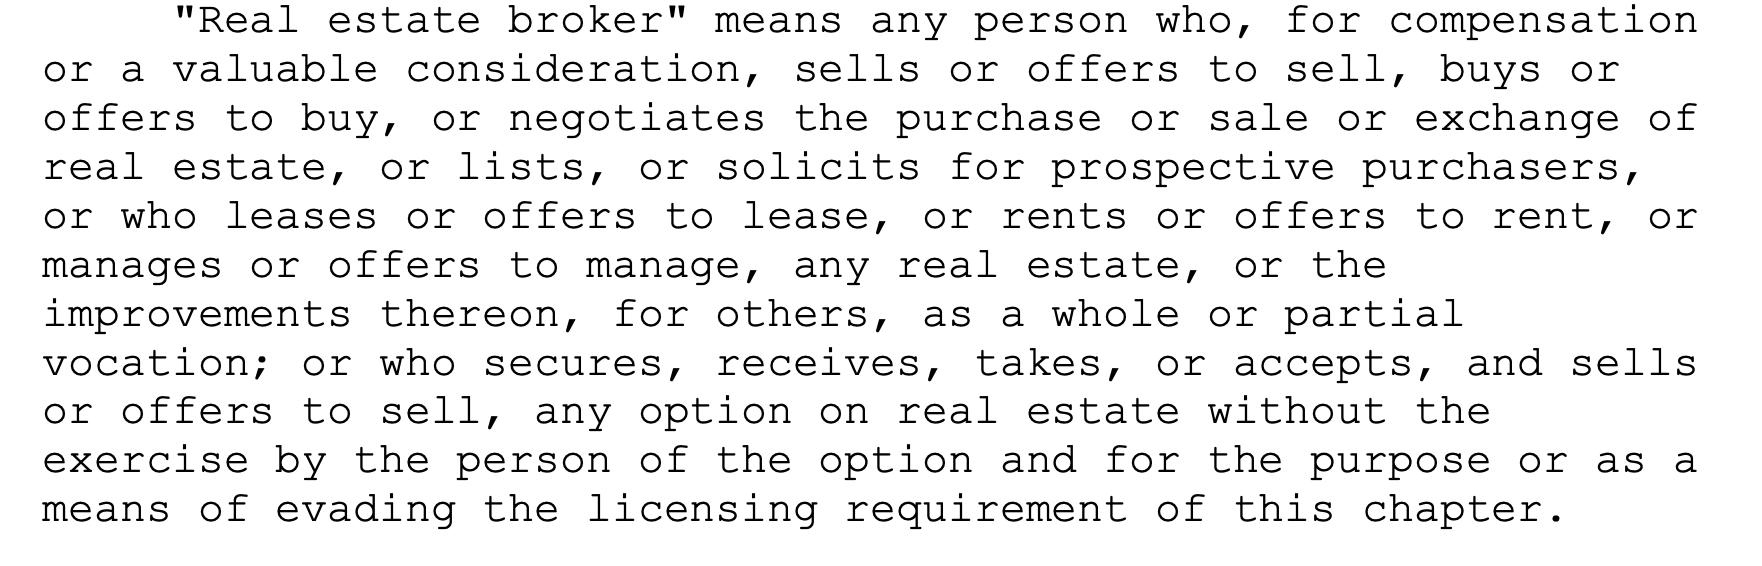 Hawaii real estate broker